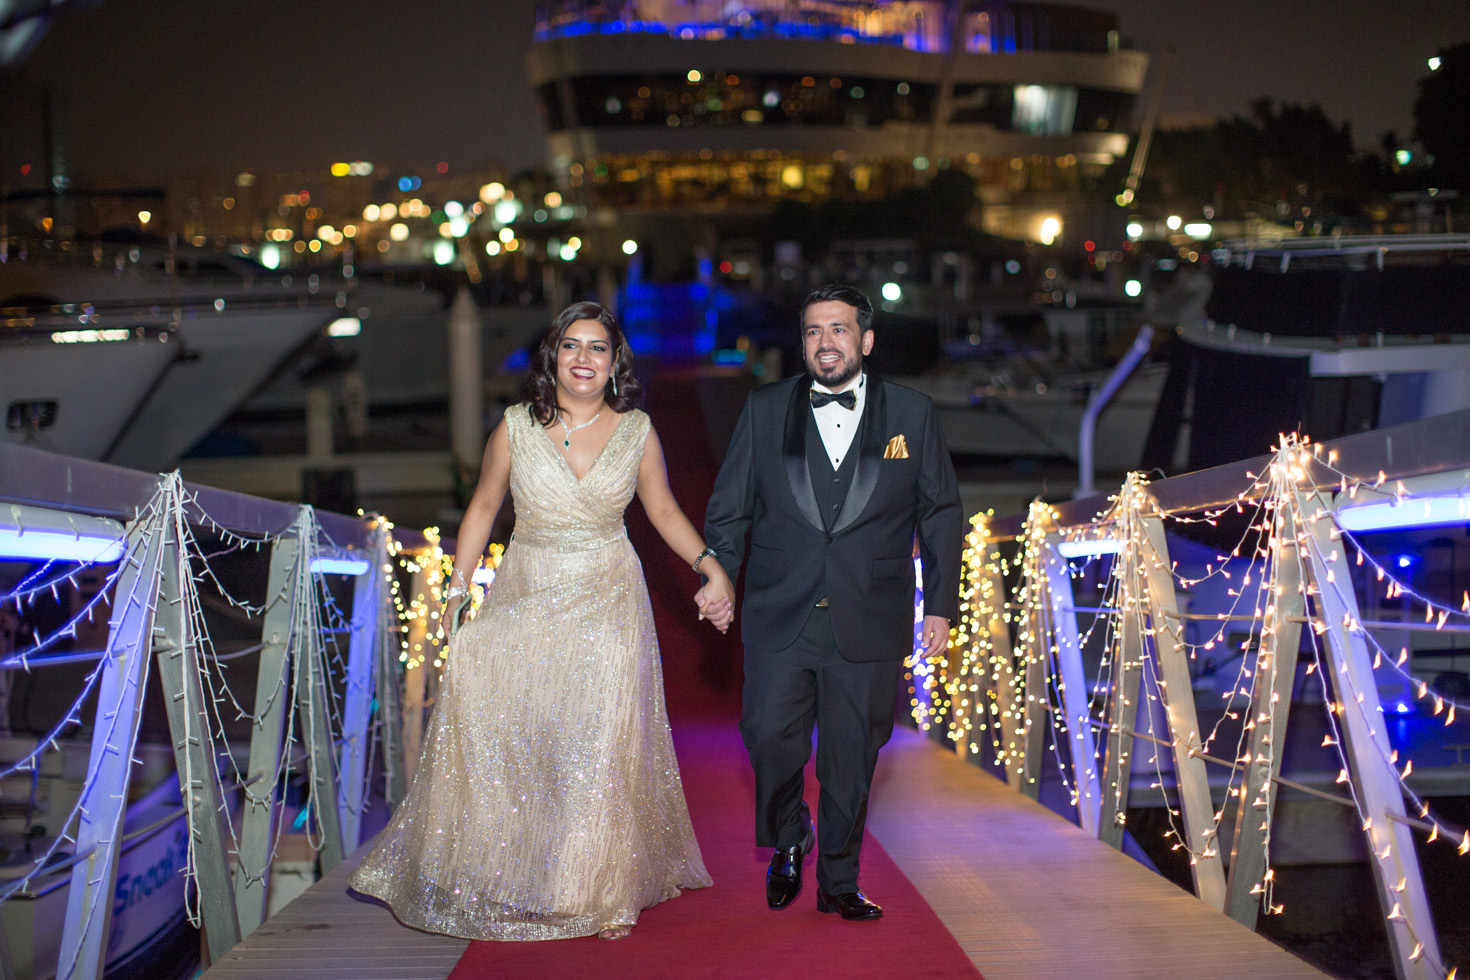 Wedding Planning During COVID 19 | Top Wedding Planners Abu Dhabi